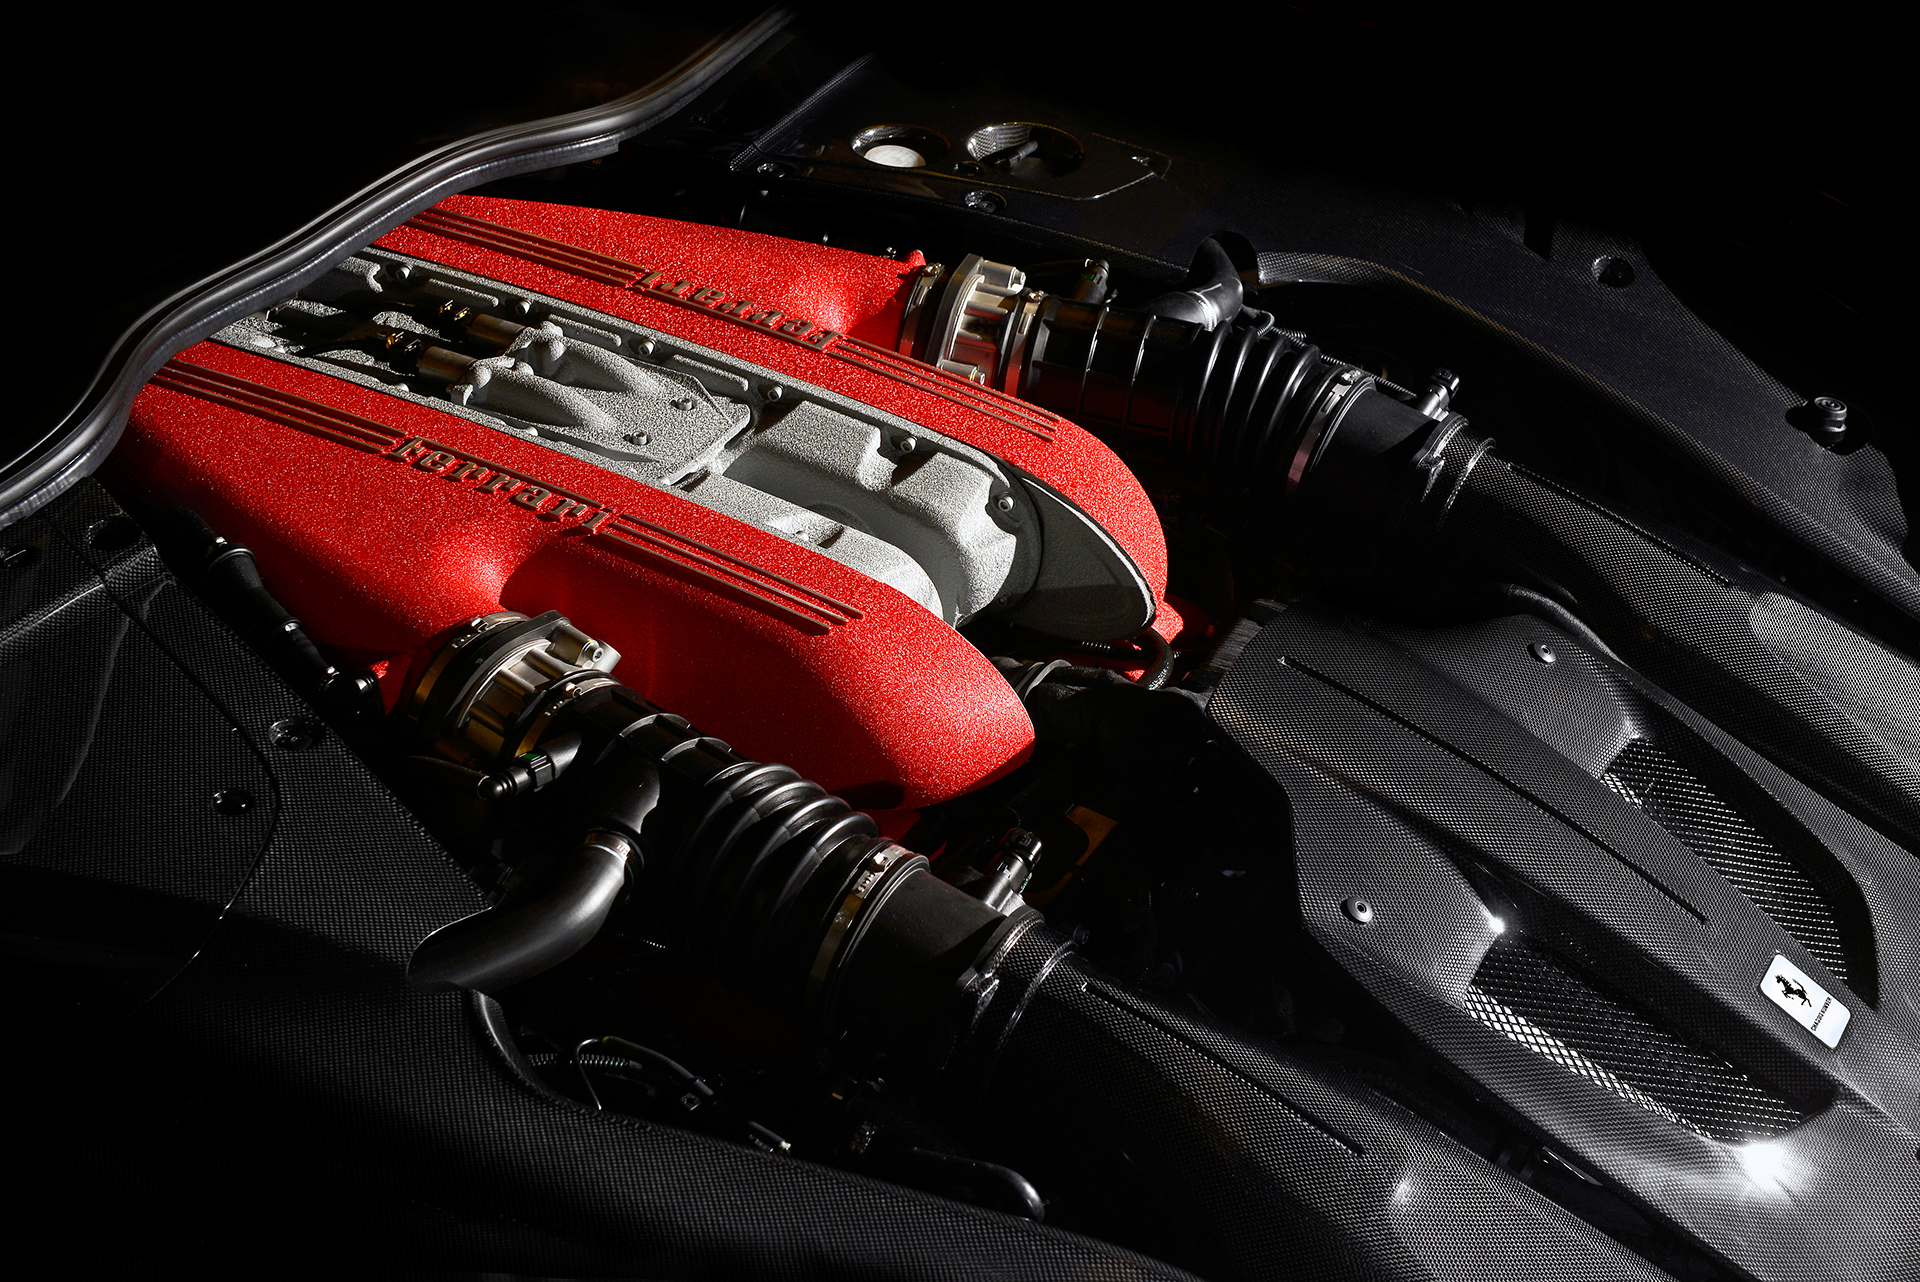 Ferrari F12tdf - V12 - moteur / engine